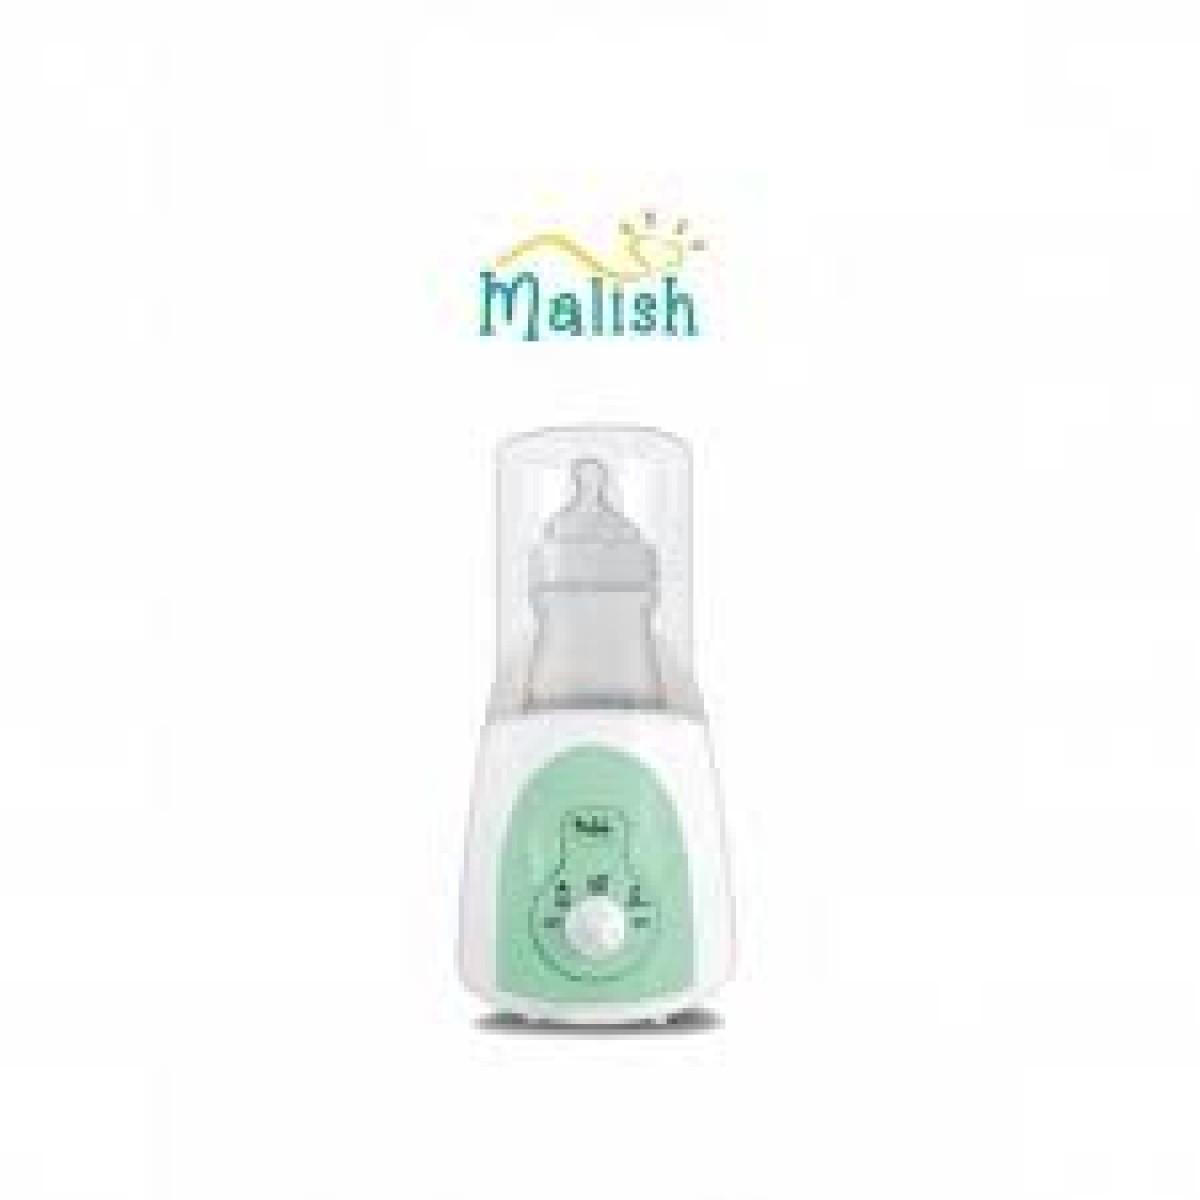 Malish Caldo Warmer/Sterilizer - Kico Baby Center